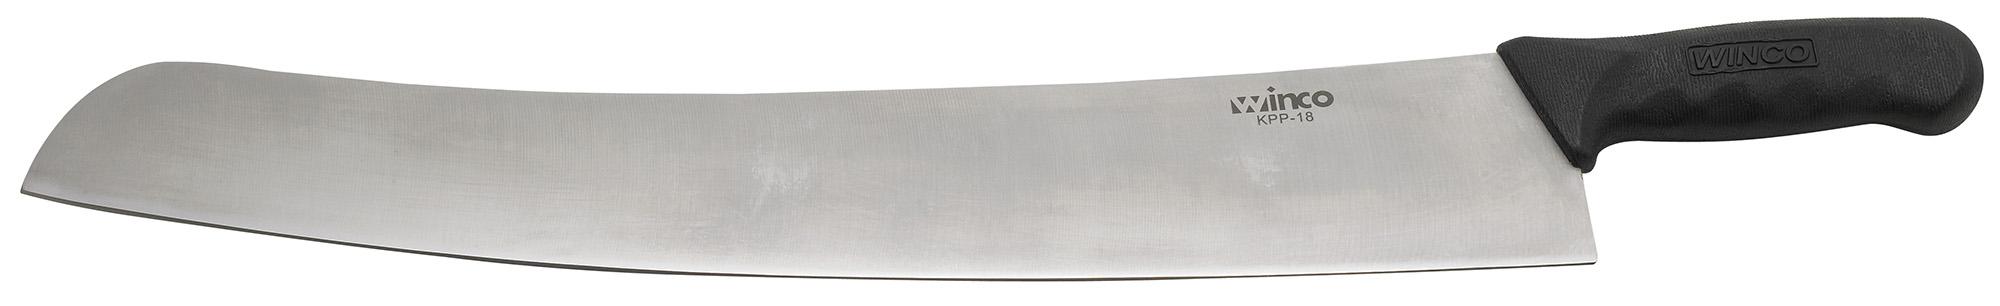 Winco KPP-18 pizza knives